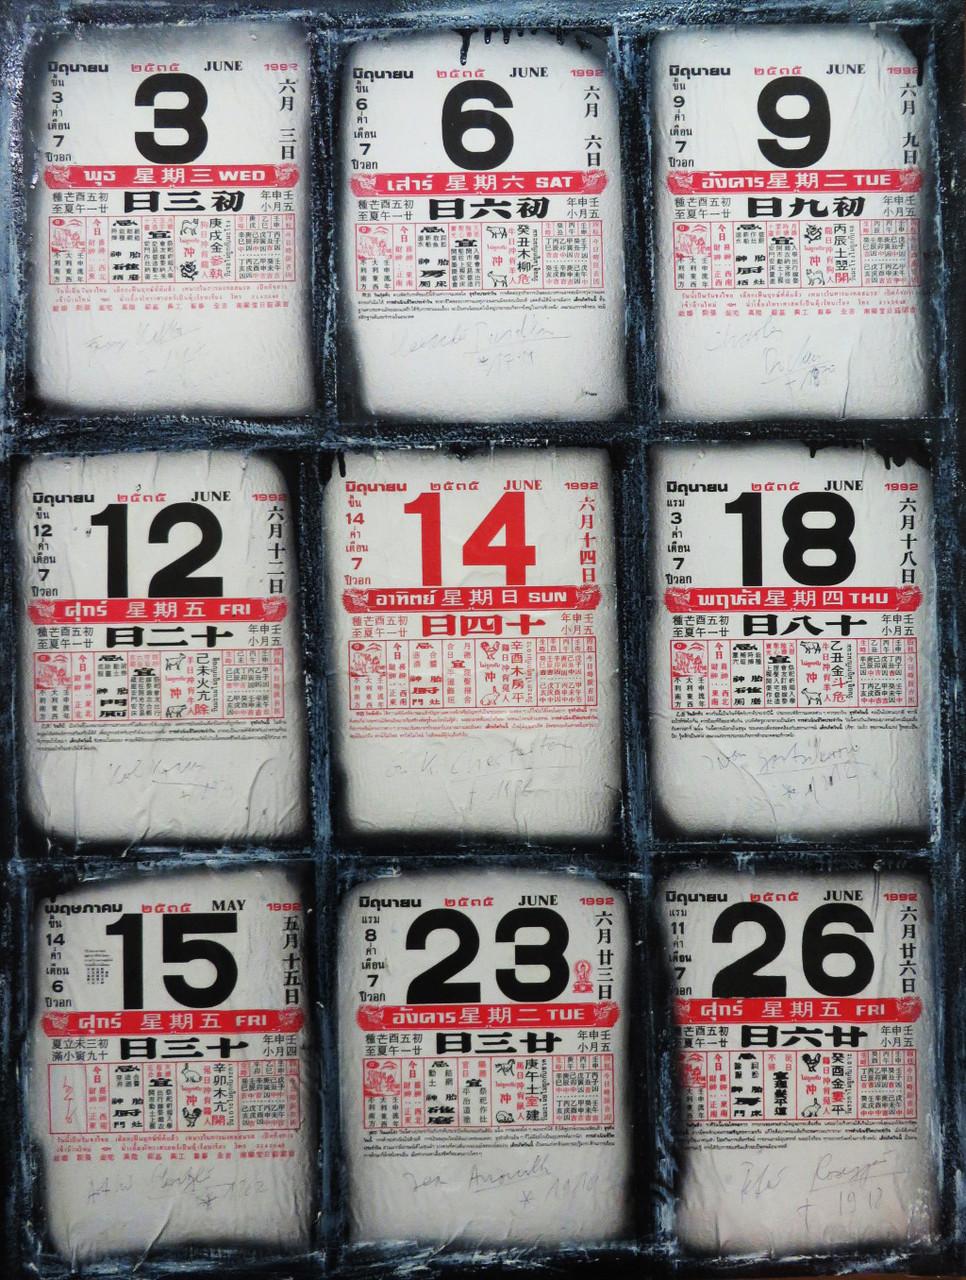 Pedro Meier Artist – Chinesische Kalenderblätter übermalt – Ölstift über Kalenderblatt auf Leinwand montiert 1998 – Foto © Pedro Meier / ProLitteris Multimedia Artist – Atelier: Gerhard Meier Weg Niederbipp – Olten – Bangkok